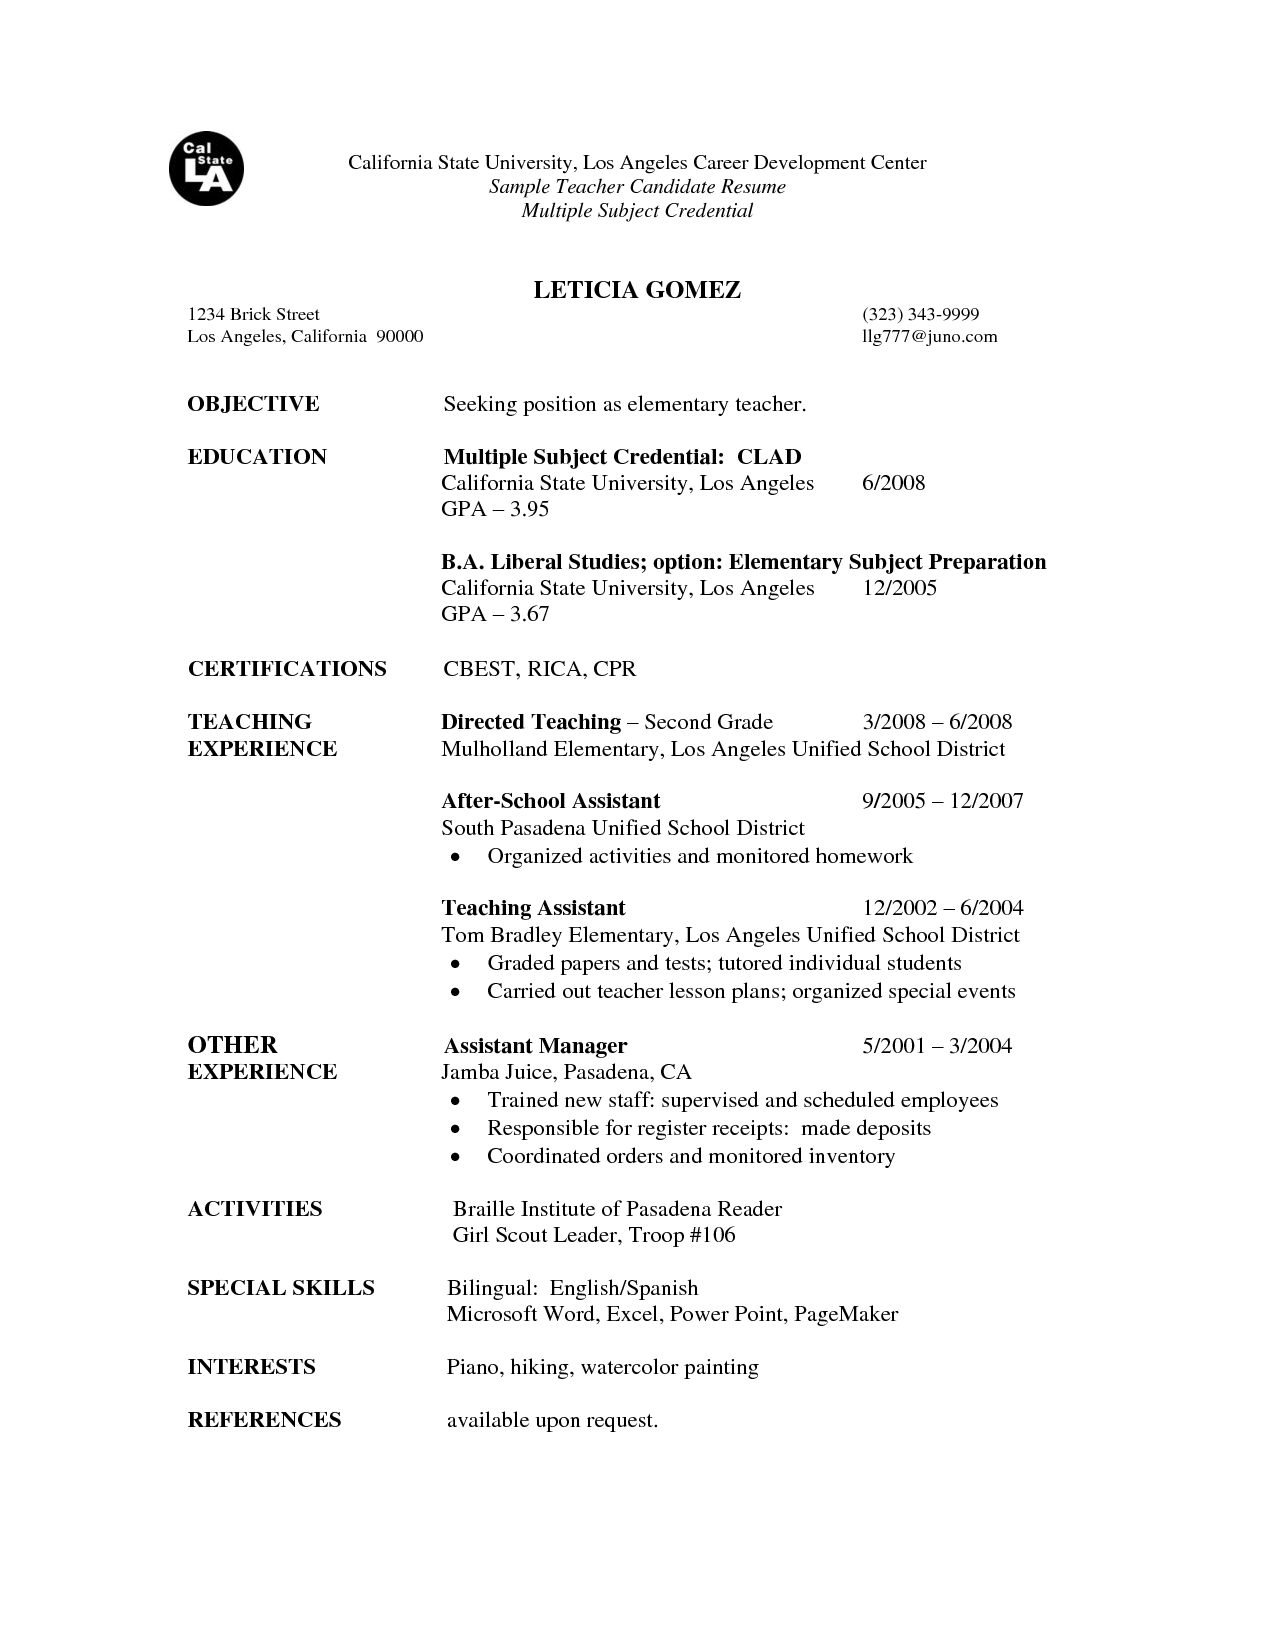 Image Result For First Resume For Teacher